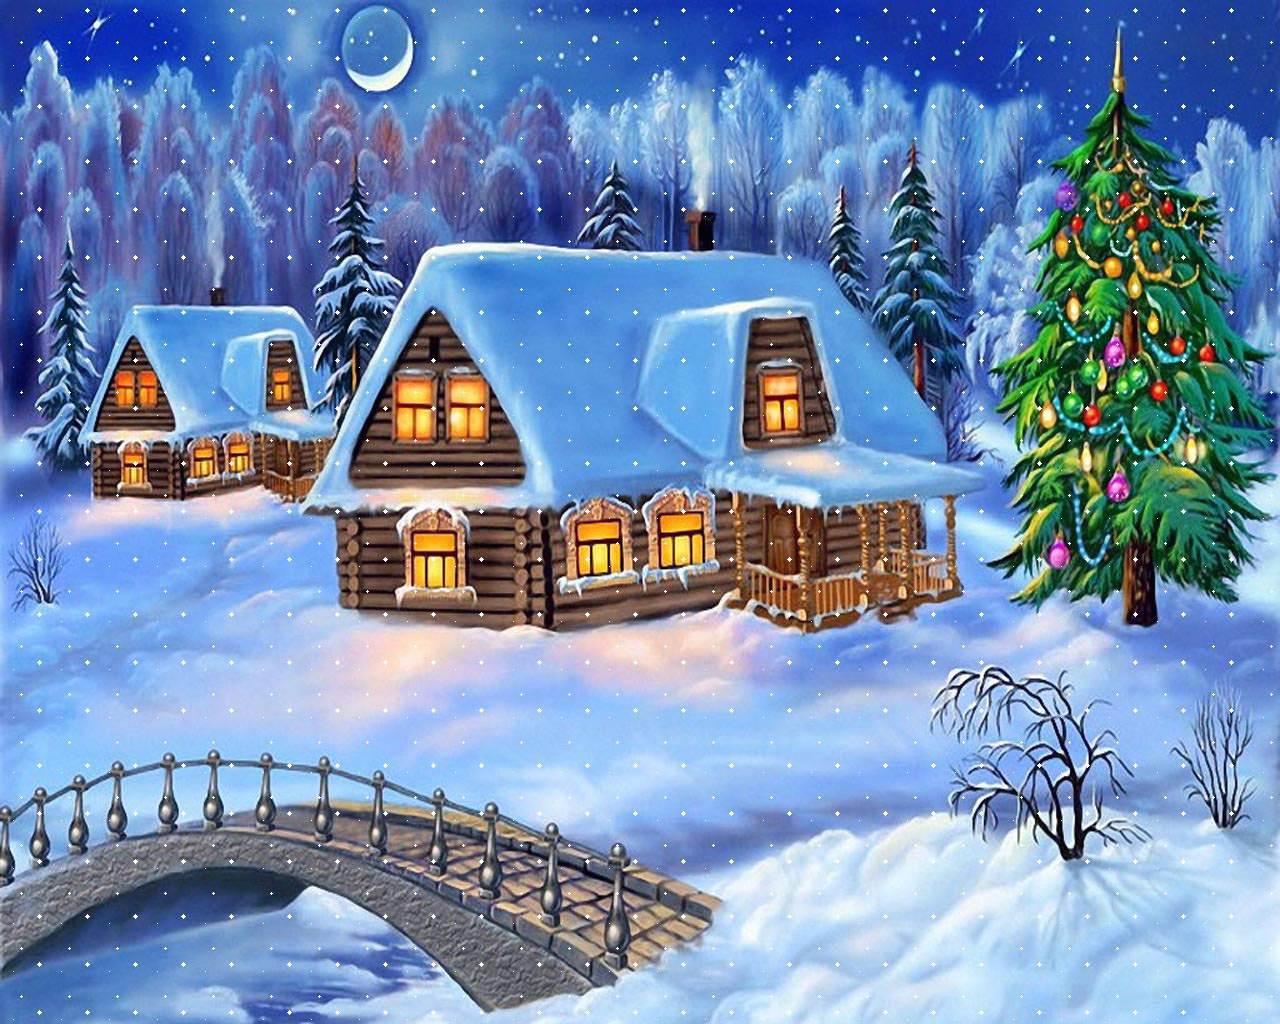 christmas desktop wallpaper Christmas Wallpapers for PC 1280x1024